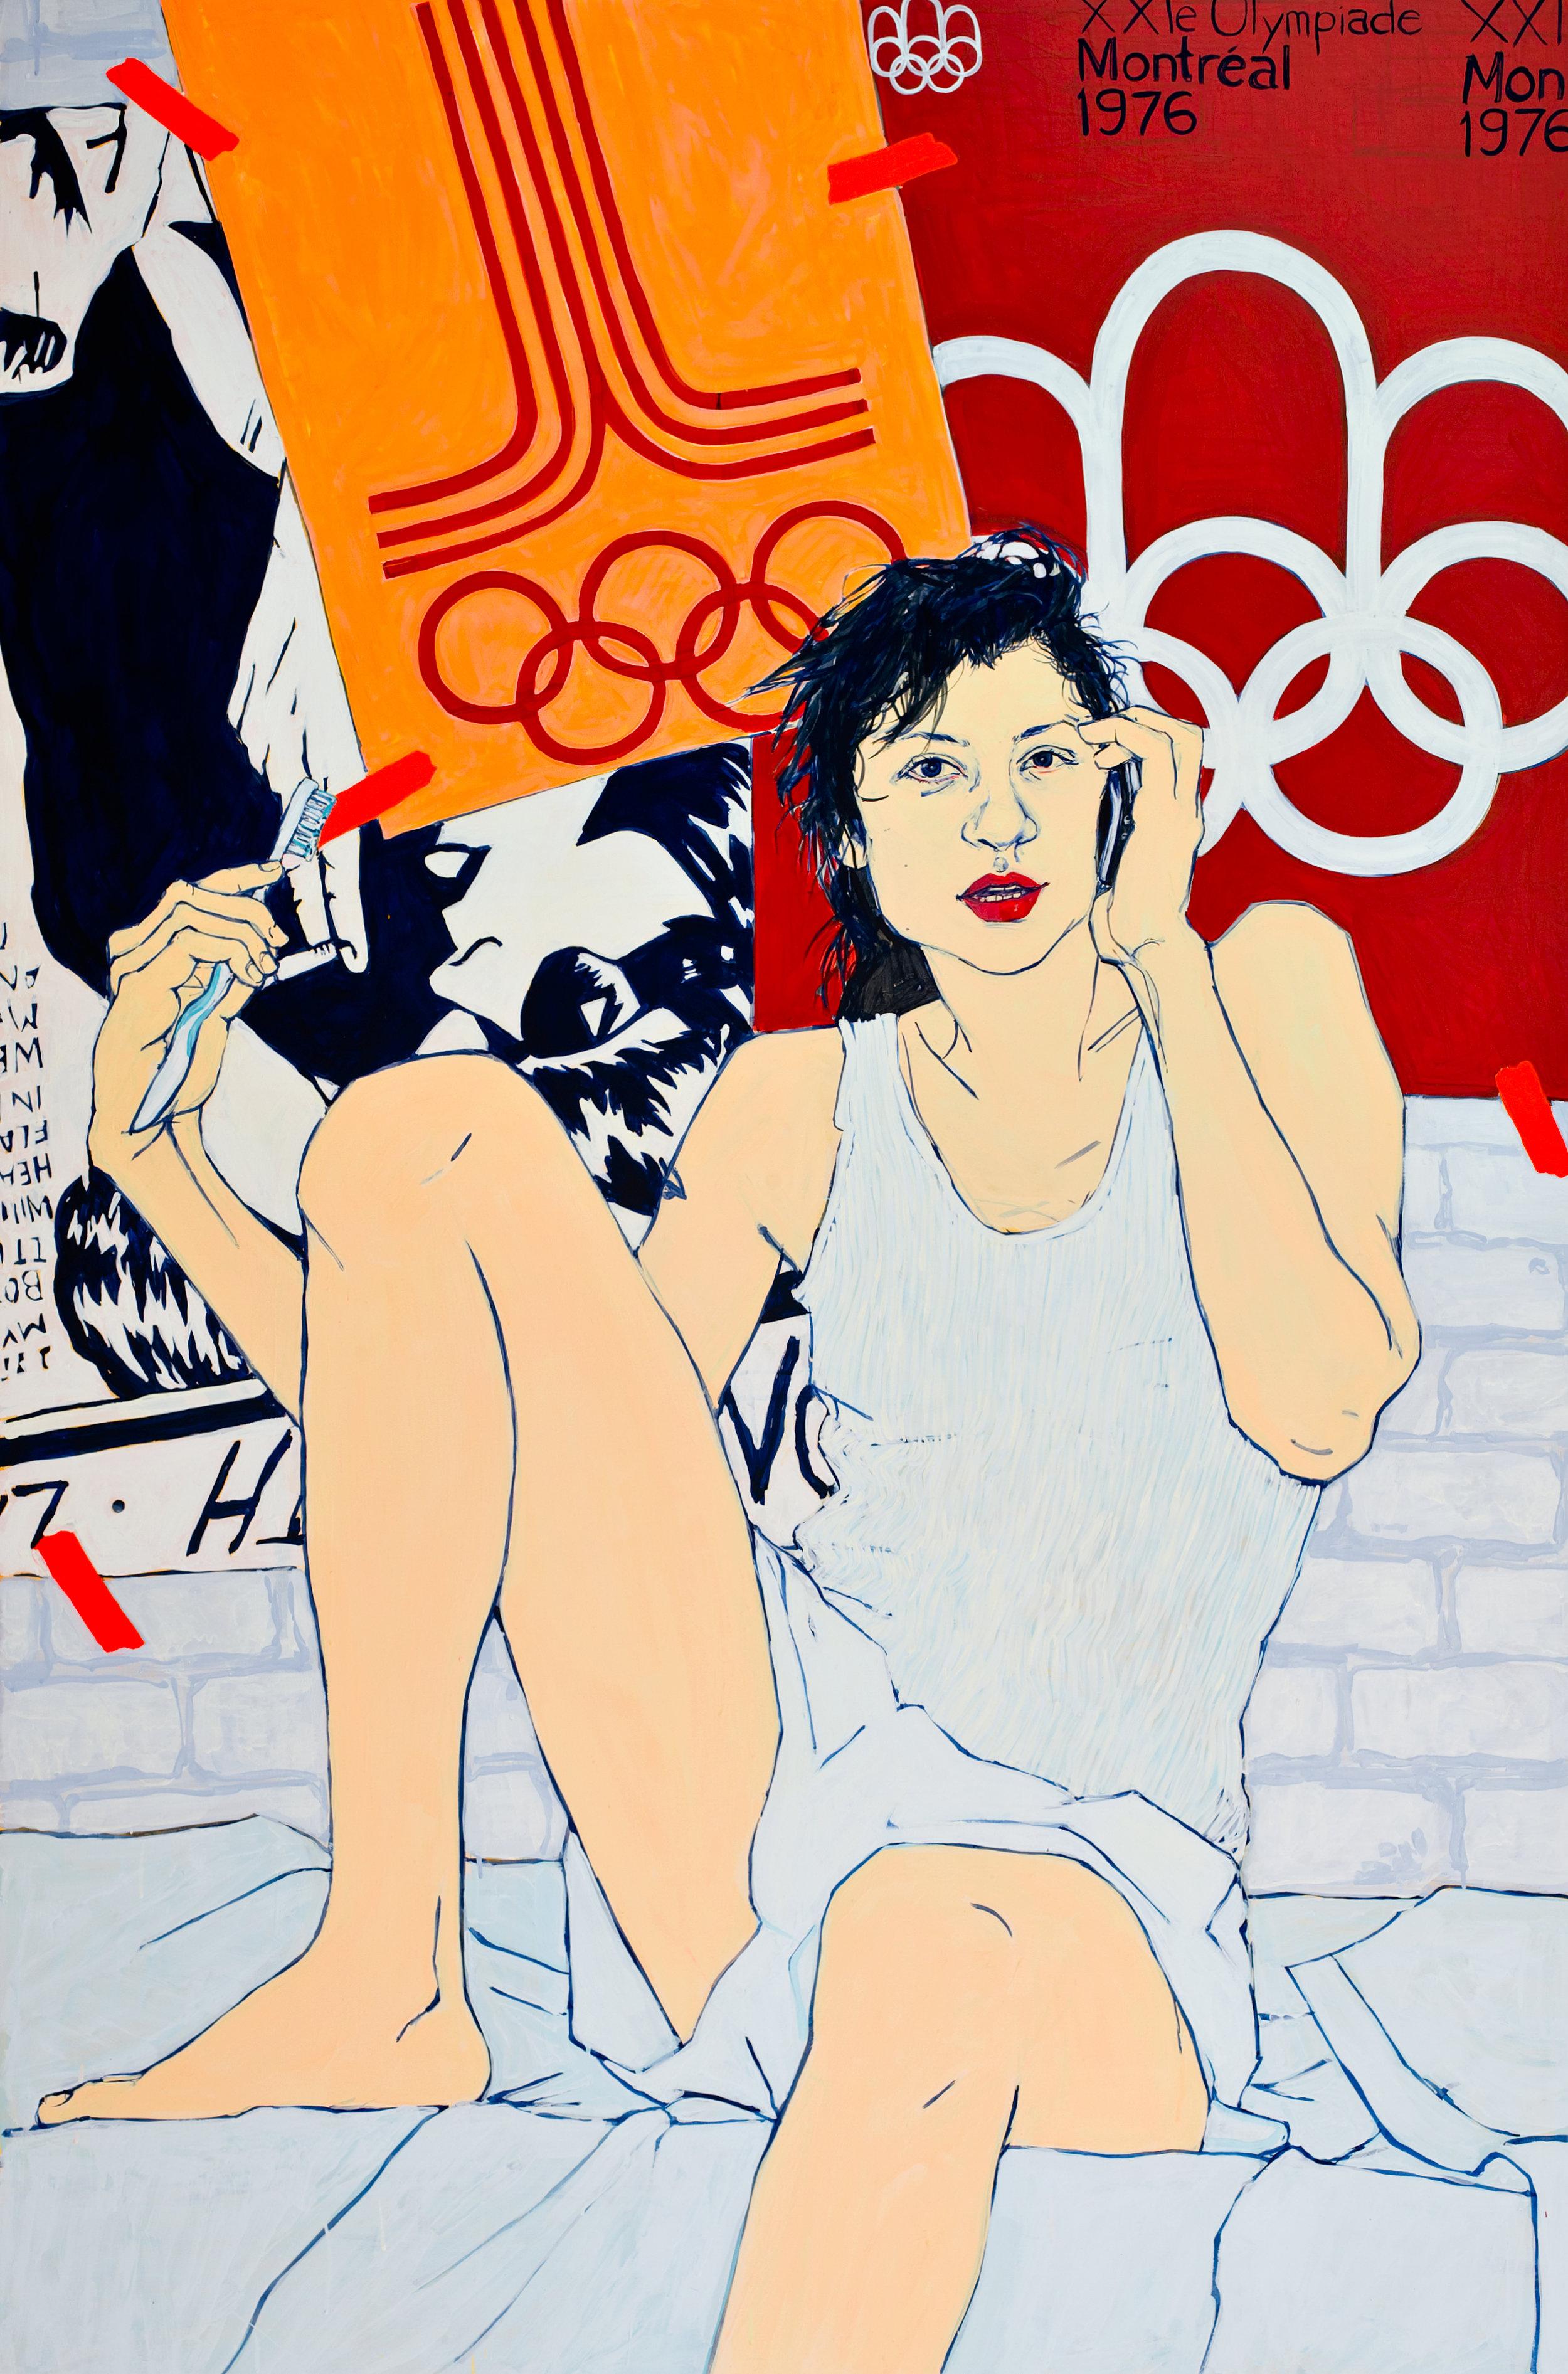 Olympic Hangover